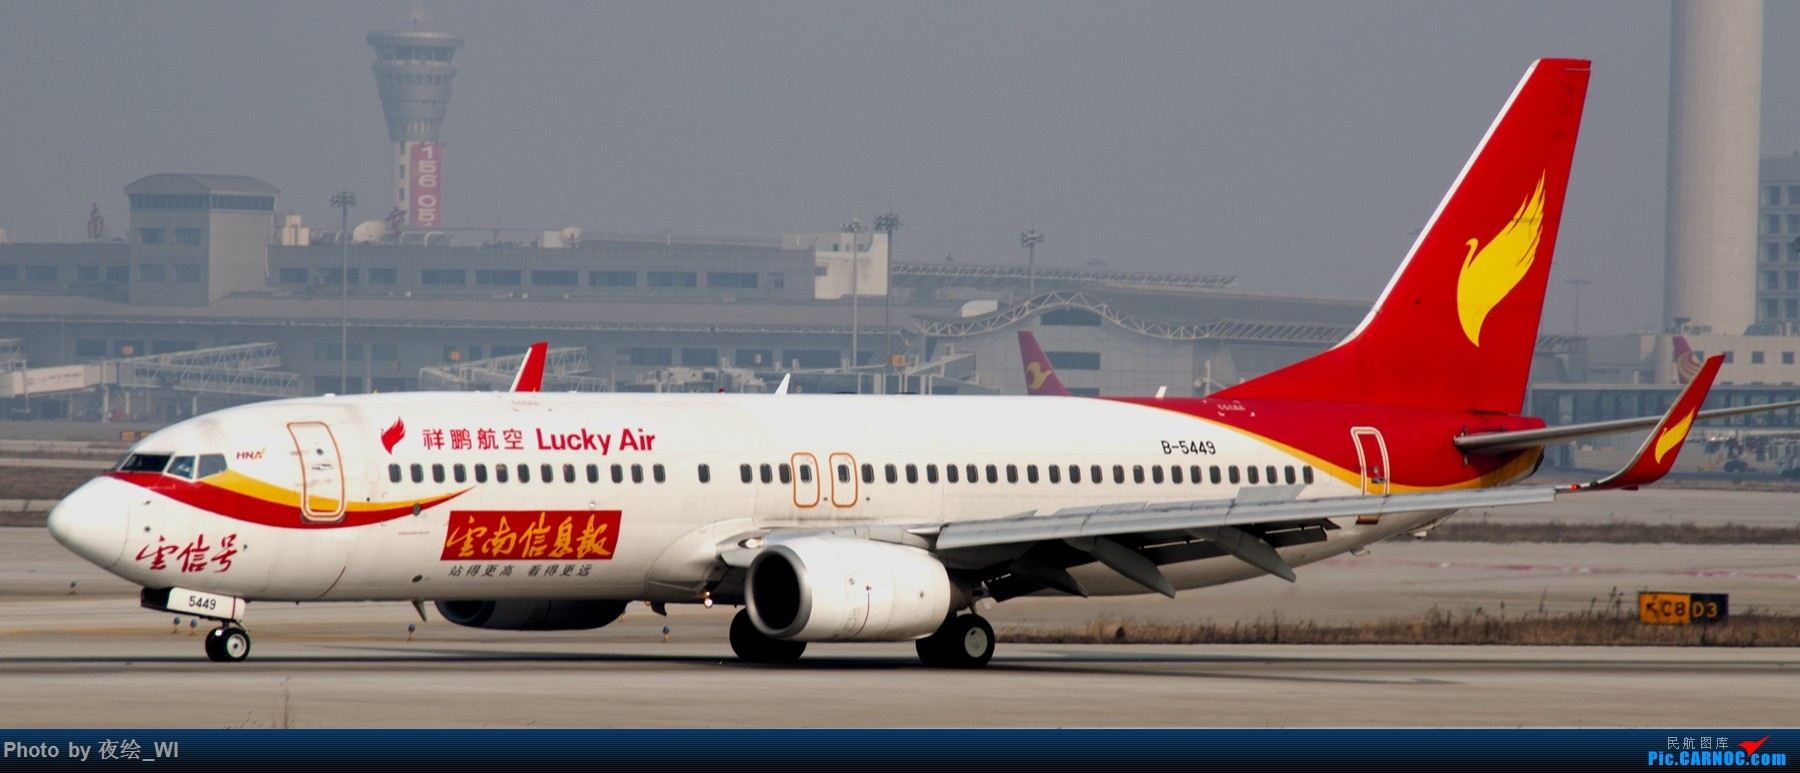 Re:[原创]NKG,2016新年第一拍,邮航734及众多彩绘 BOEING 737-800 B-5449 中国南京禄口国际机场